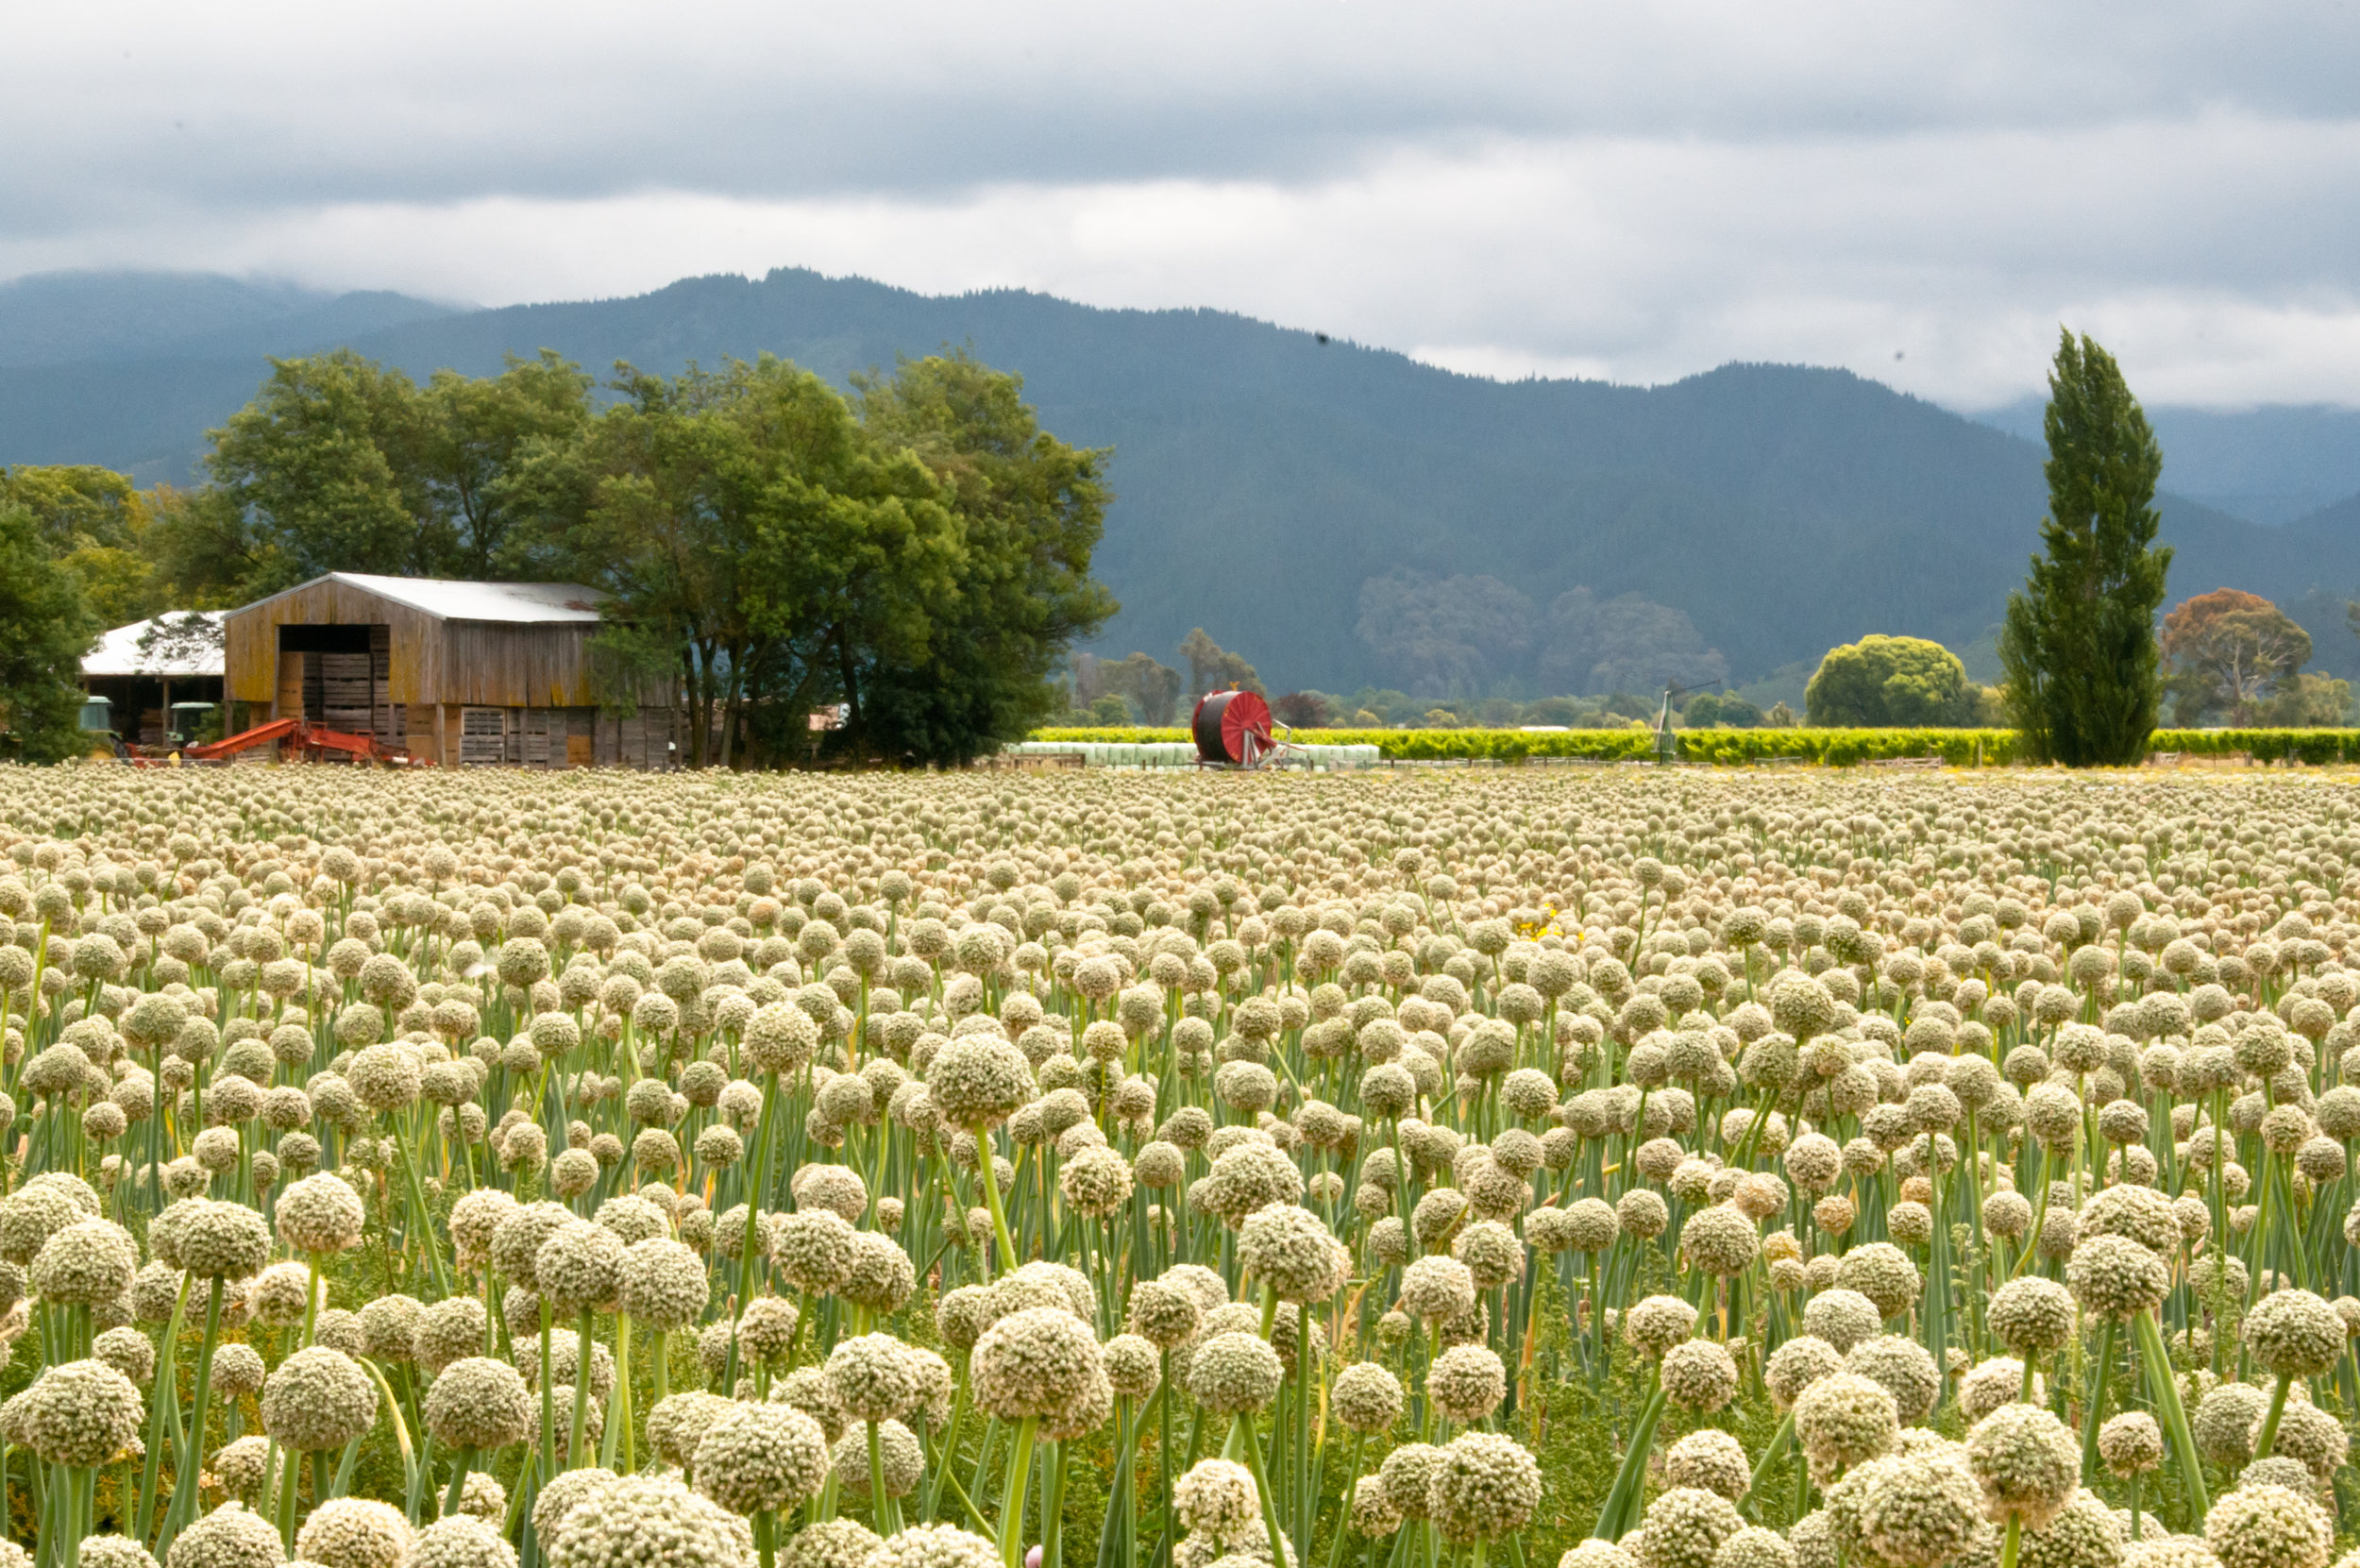 Kiwi Farm - New Zealand - 2012